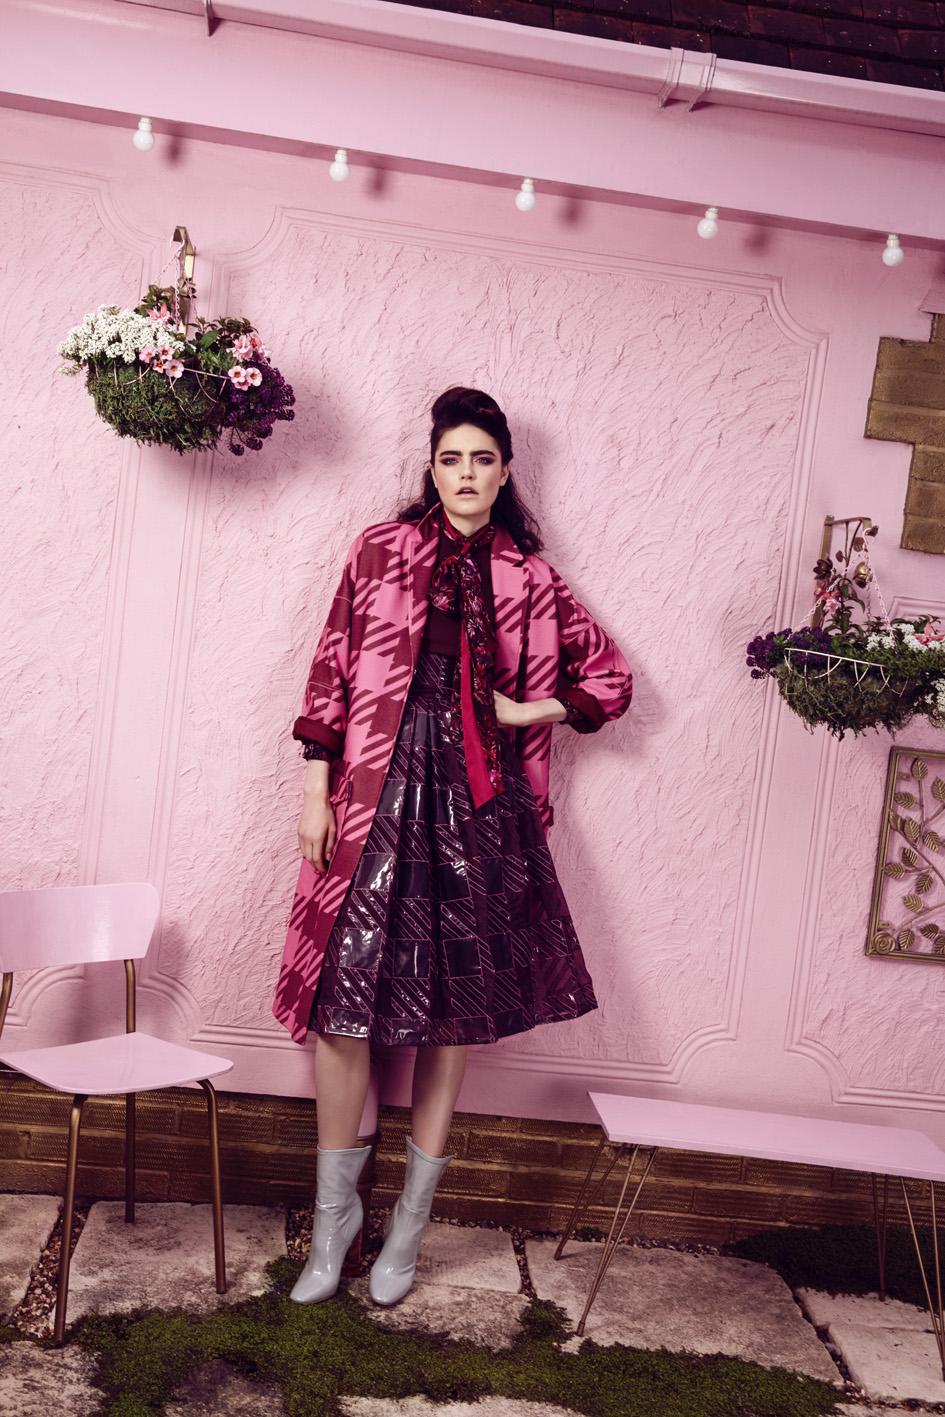 julia_kennedy_daphne_velghe_pink_house_06.jpg